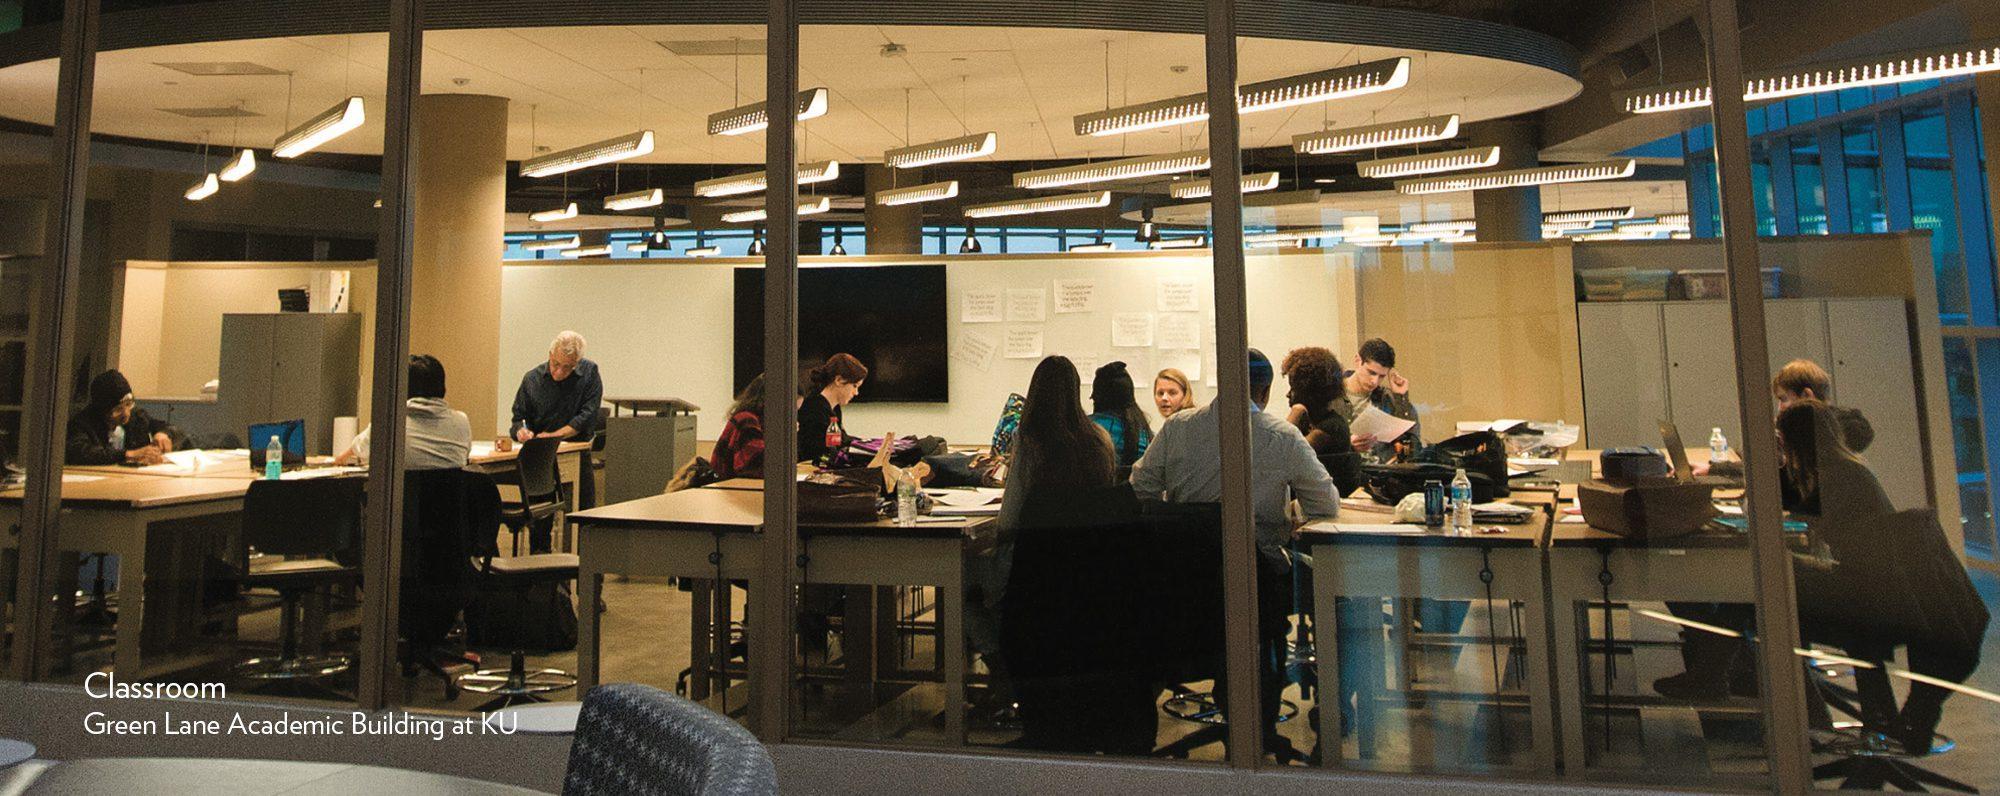 greenlane_classroom